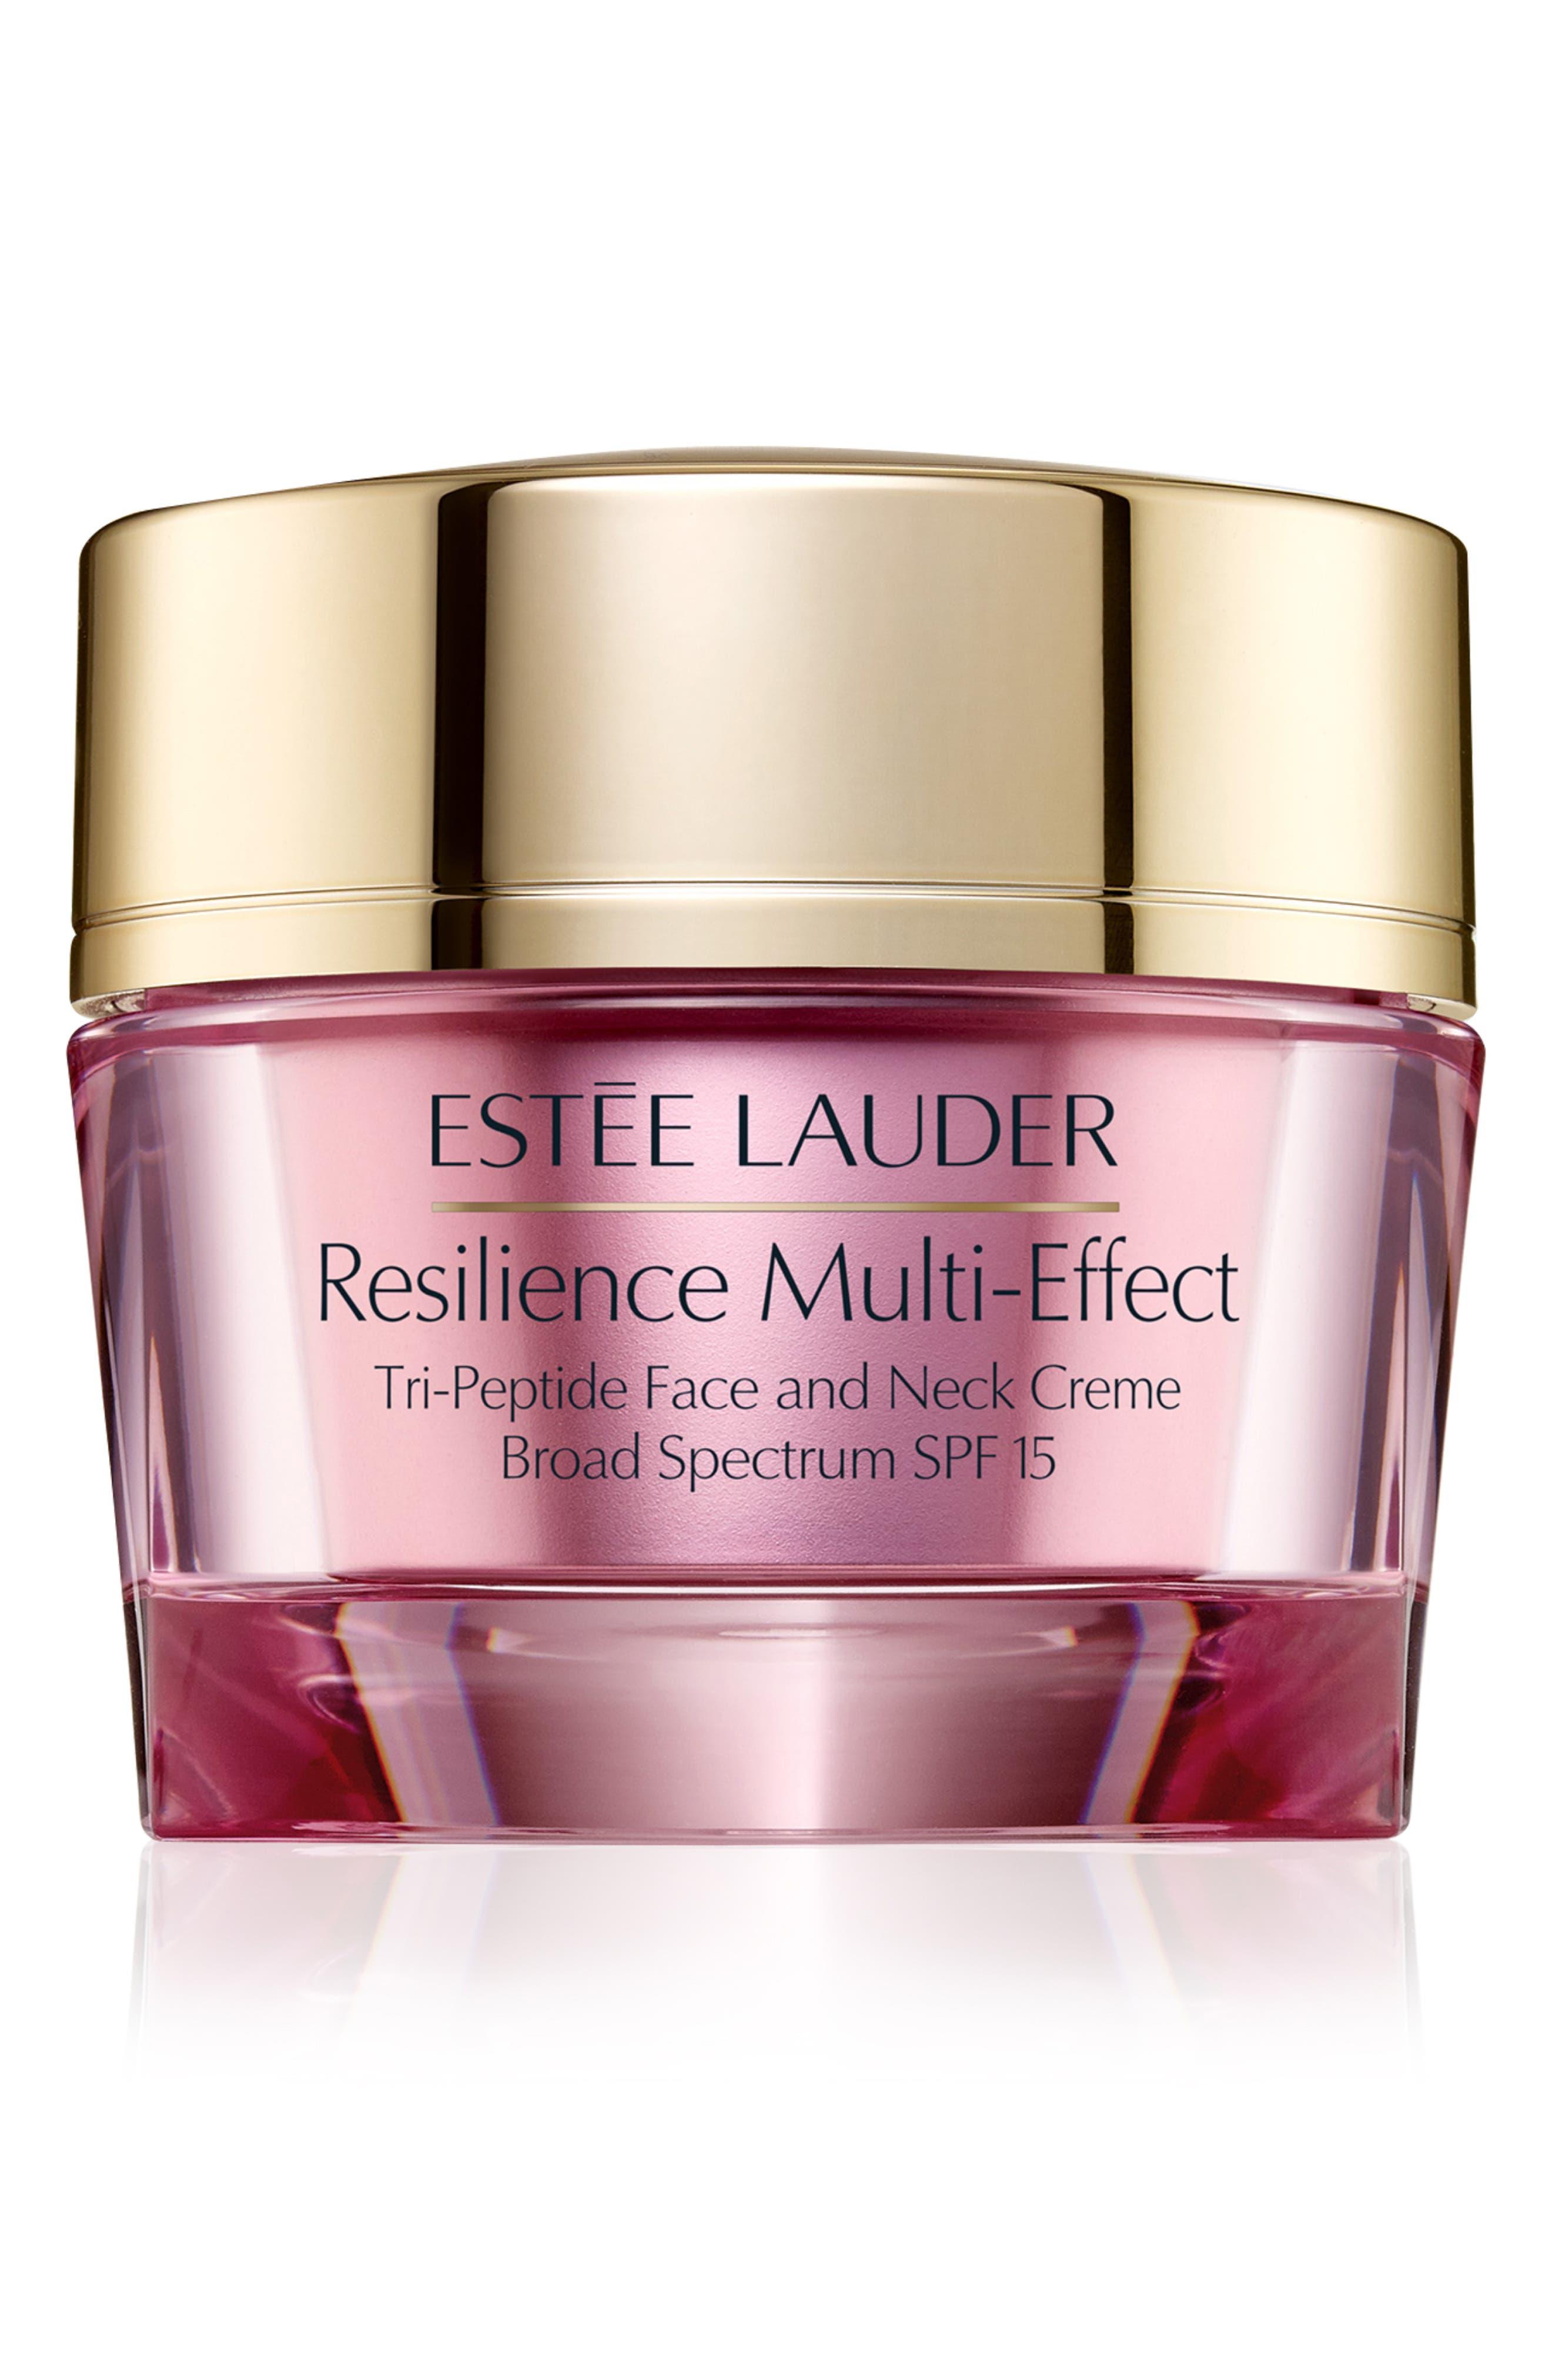 ESTÉE LAUDER, Resilience Multi-Effect Tri-Peptide Face and Neck Creme SPF 15 for Normal/Combination Skin, Main thumbnail 1, color, NO COLOR